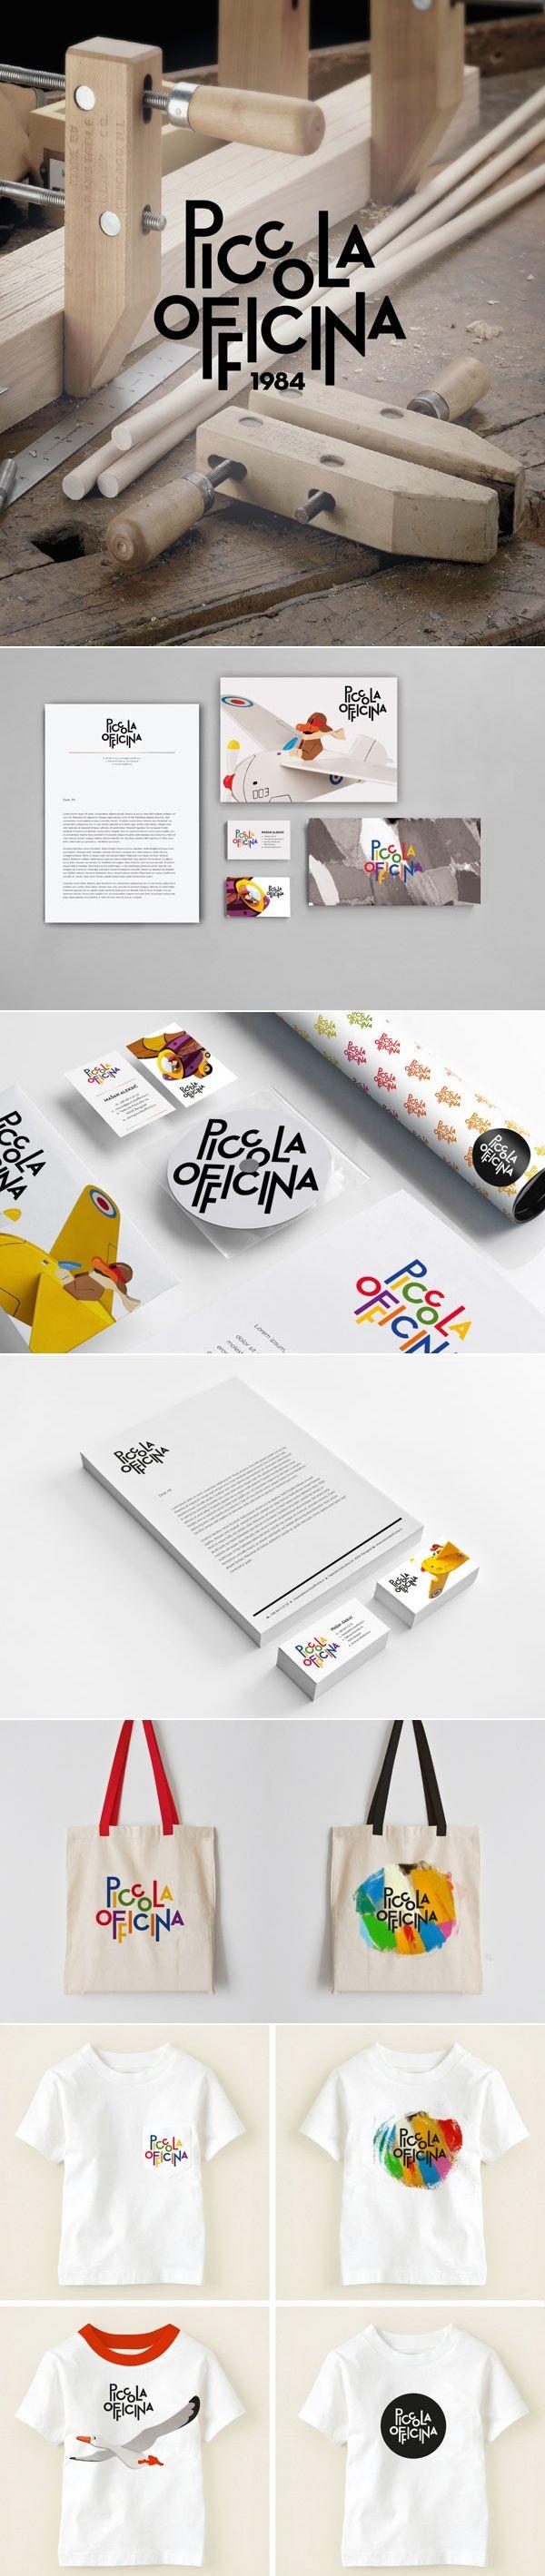 Piccola Officina – Brand Identity.